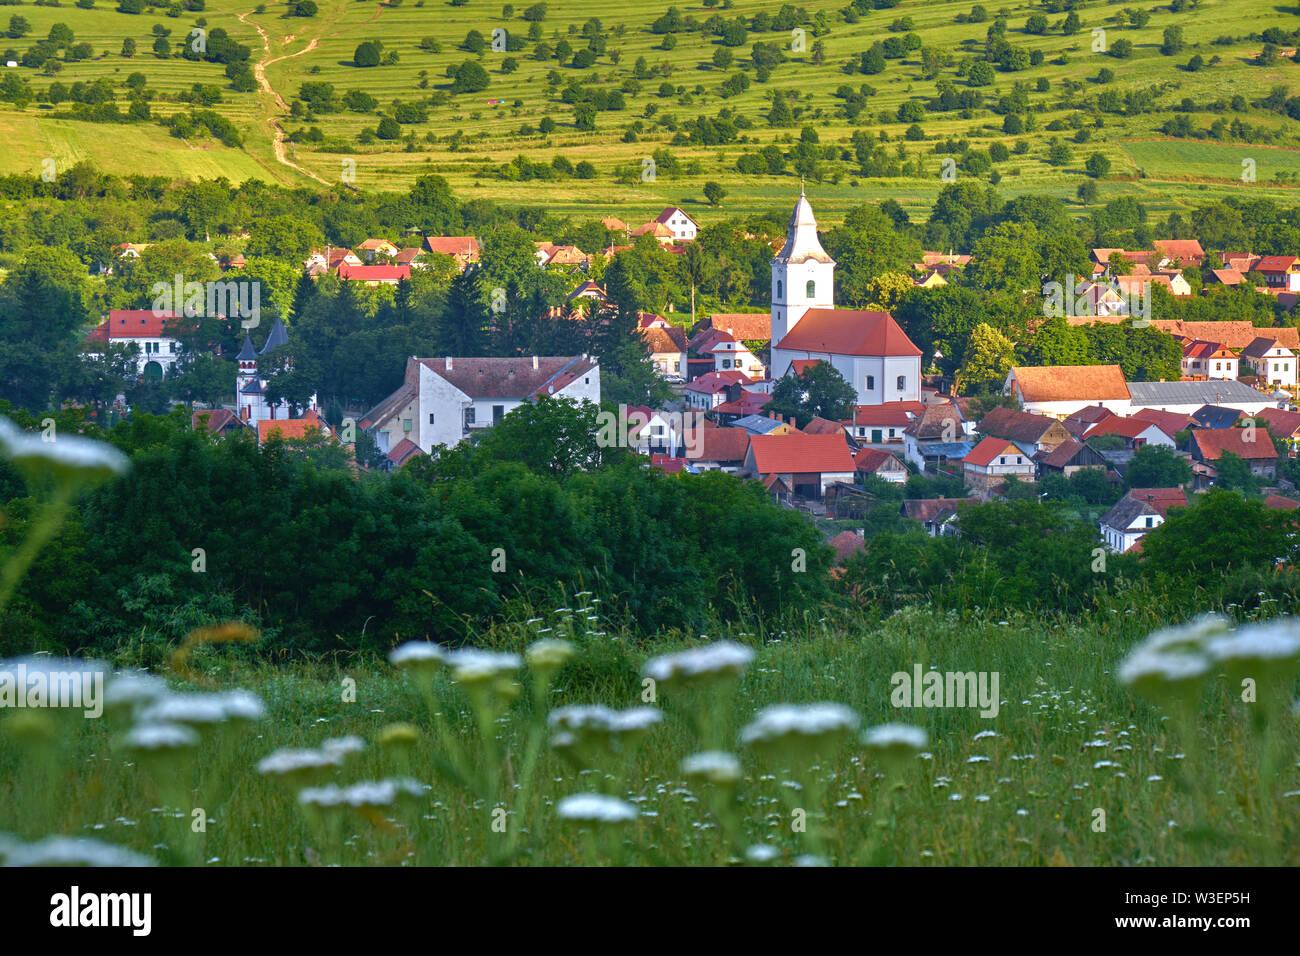 Rimetea village (Torocko in Hungarian or Eisenmarkt, Eisenburg, Traschen in German) with white church and traditional Transylvanian homes, early morni - Stock Image